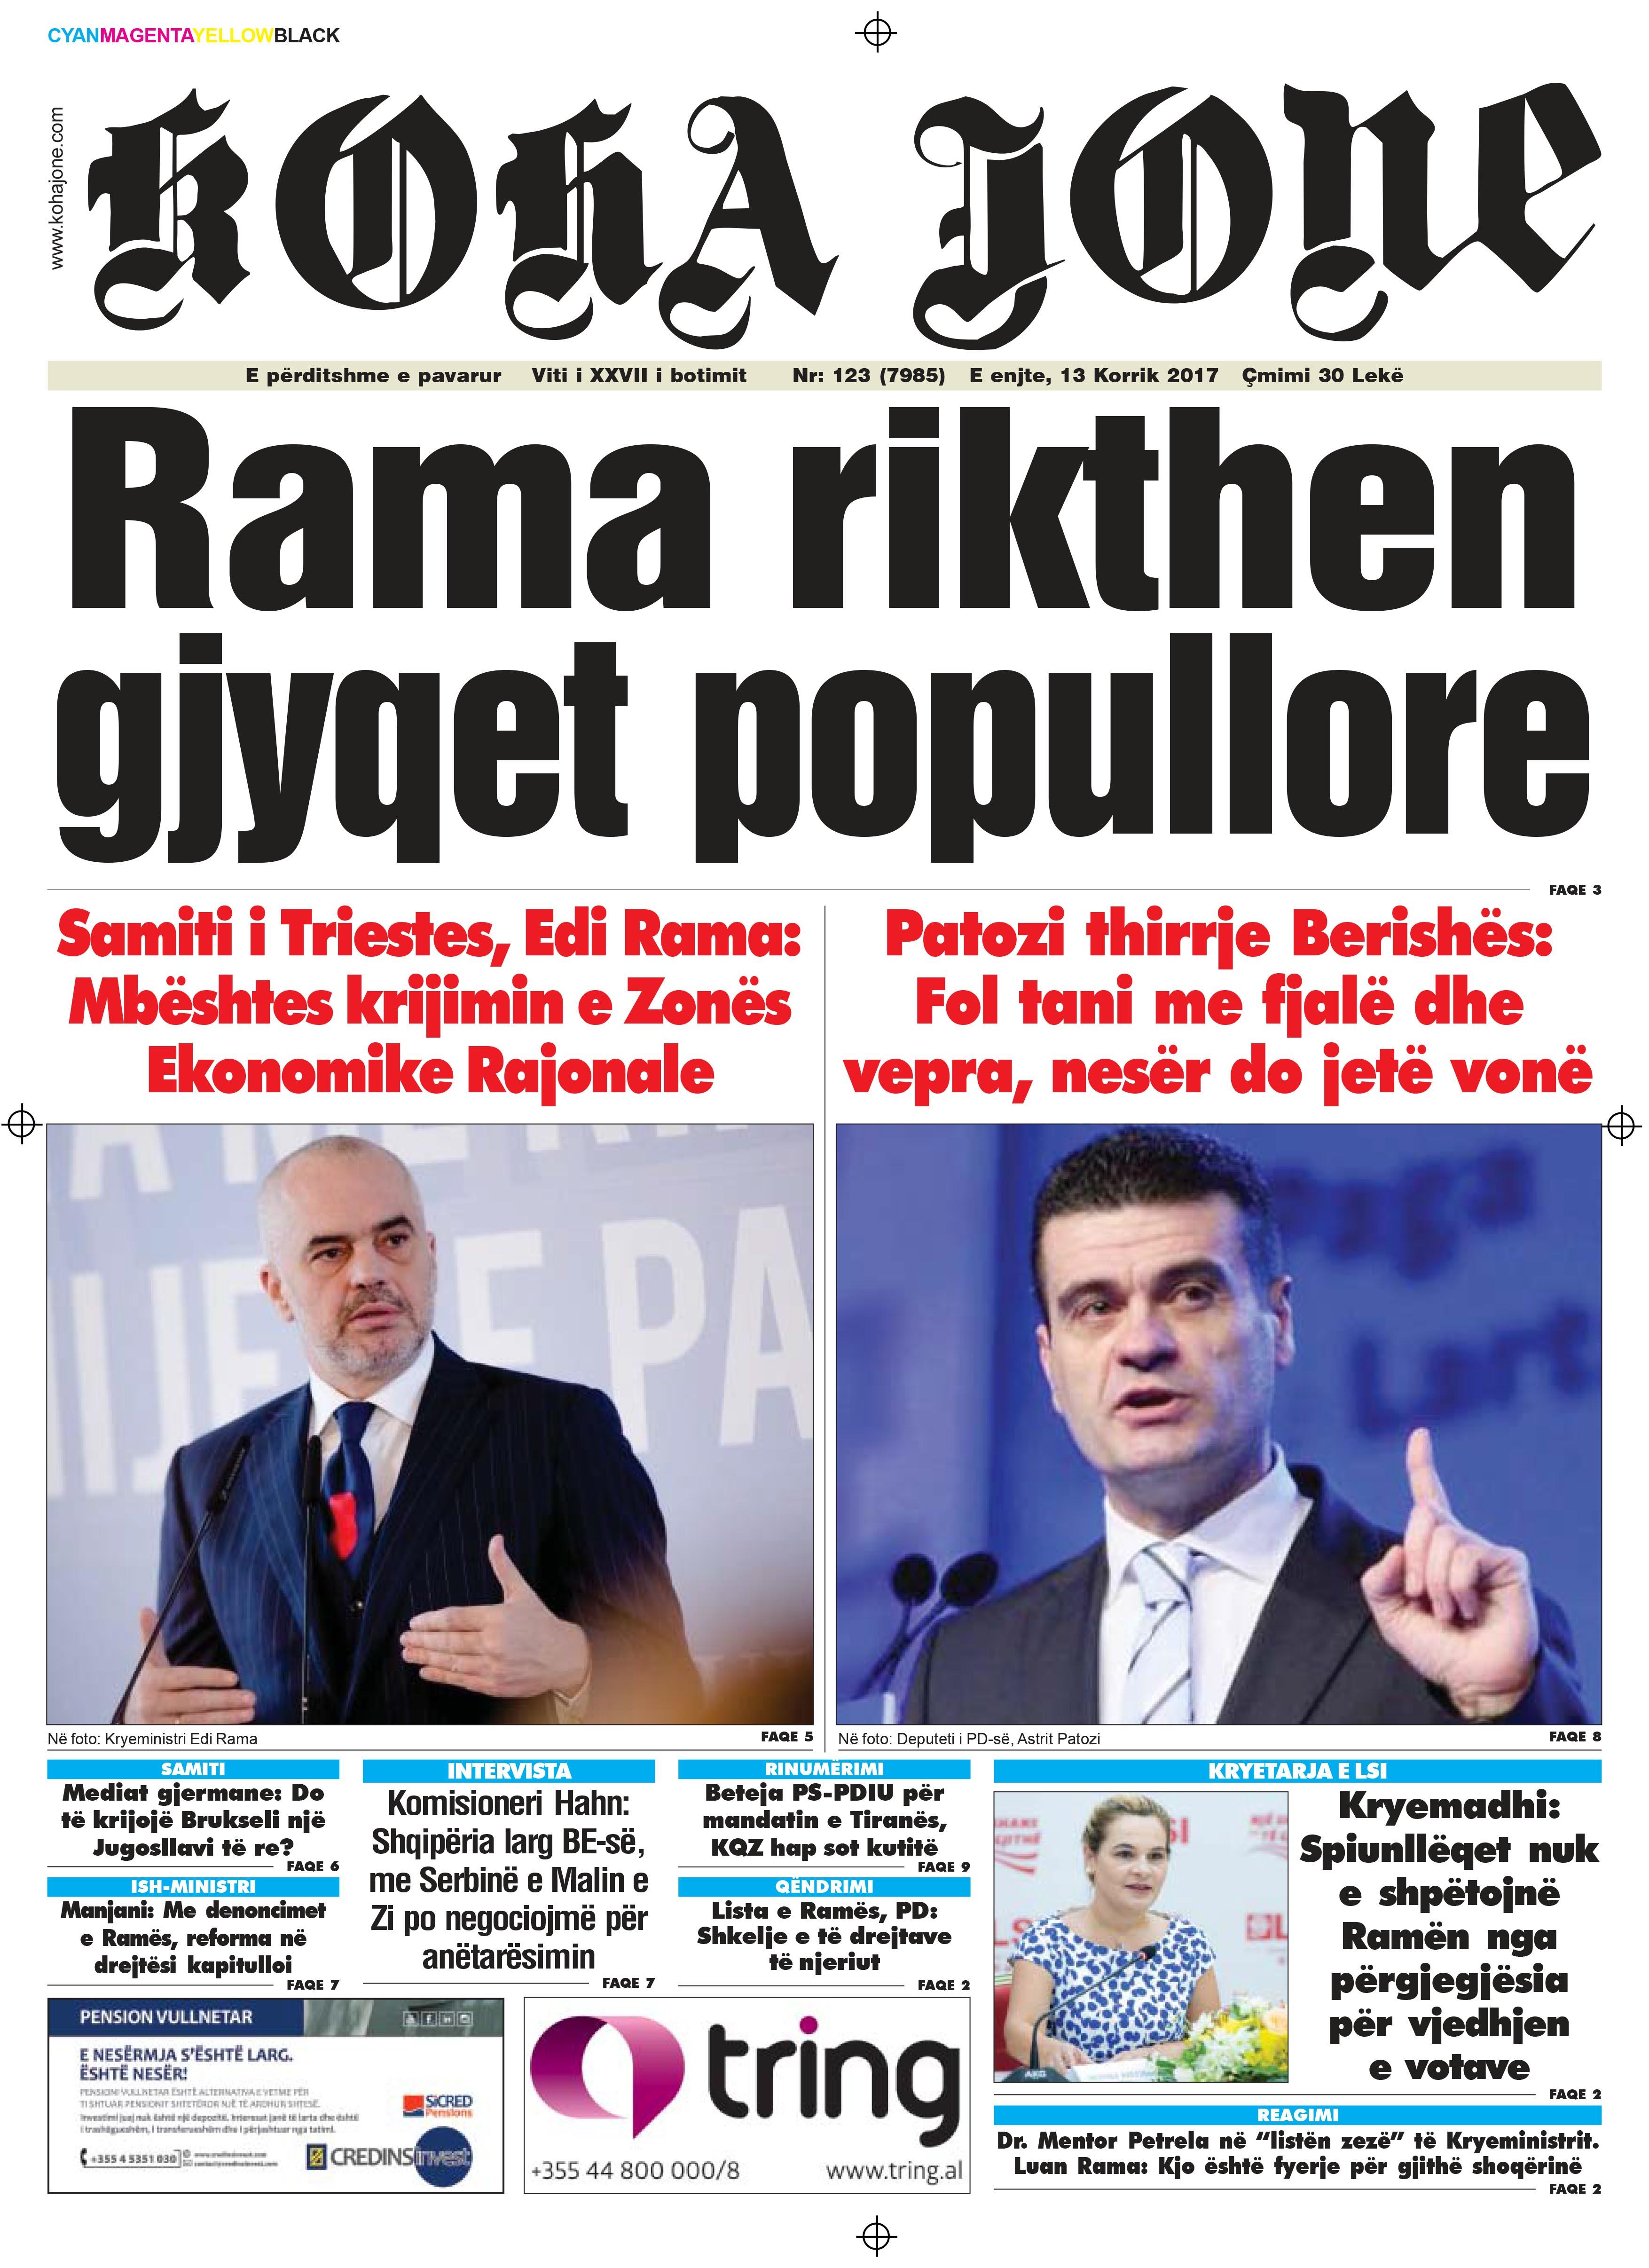 Zeitungen Kohajone heute 13. August 2016